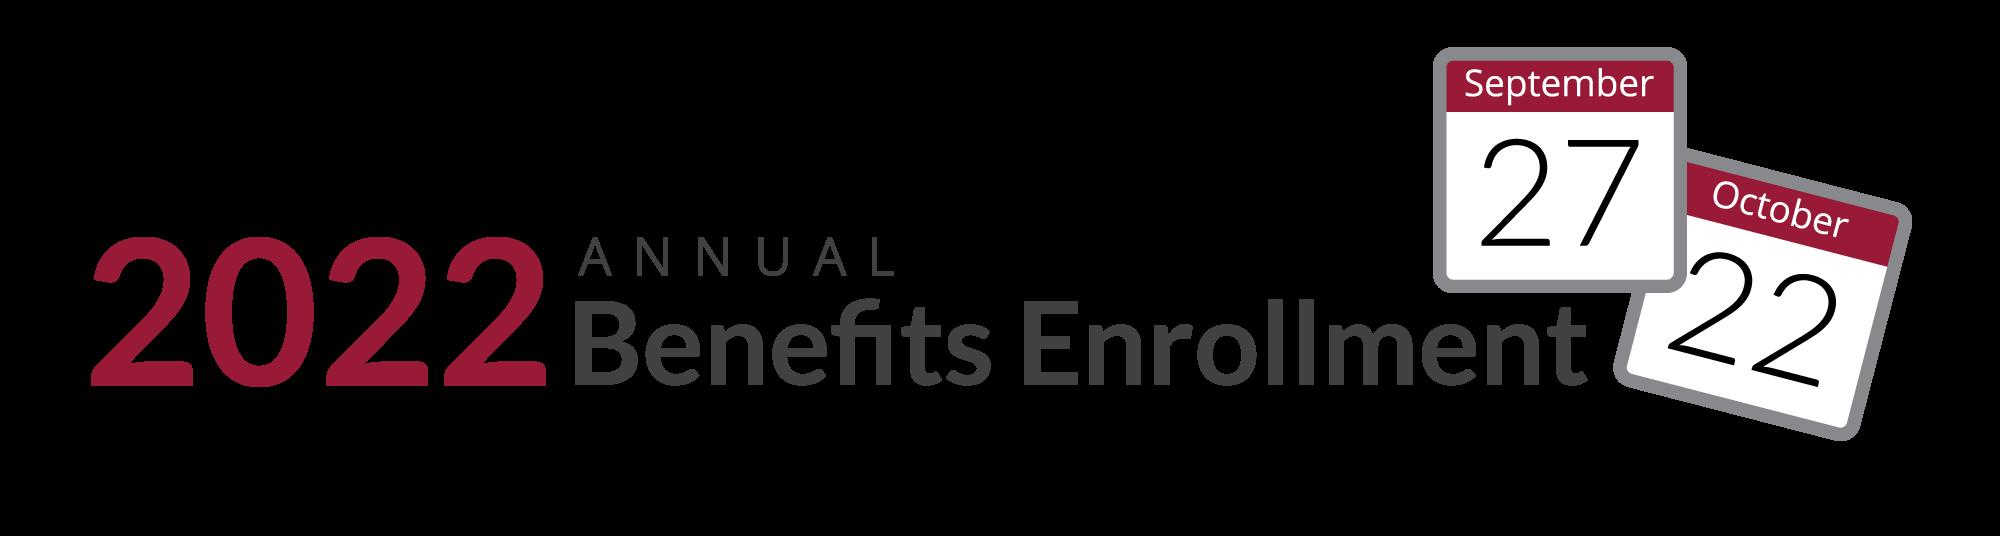 Annual Benefits Enrollment banner